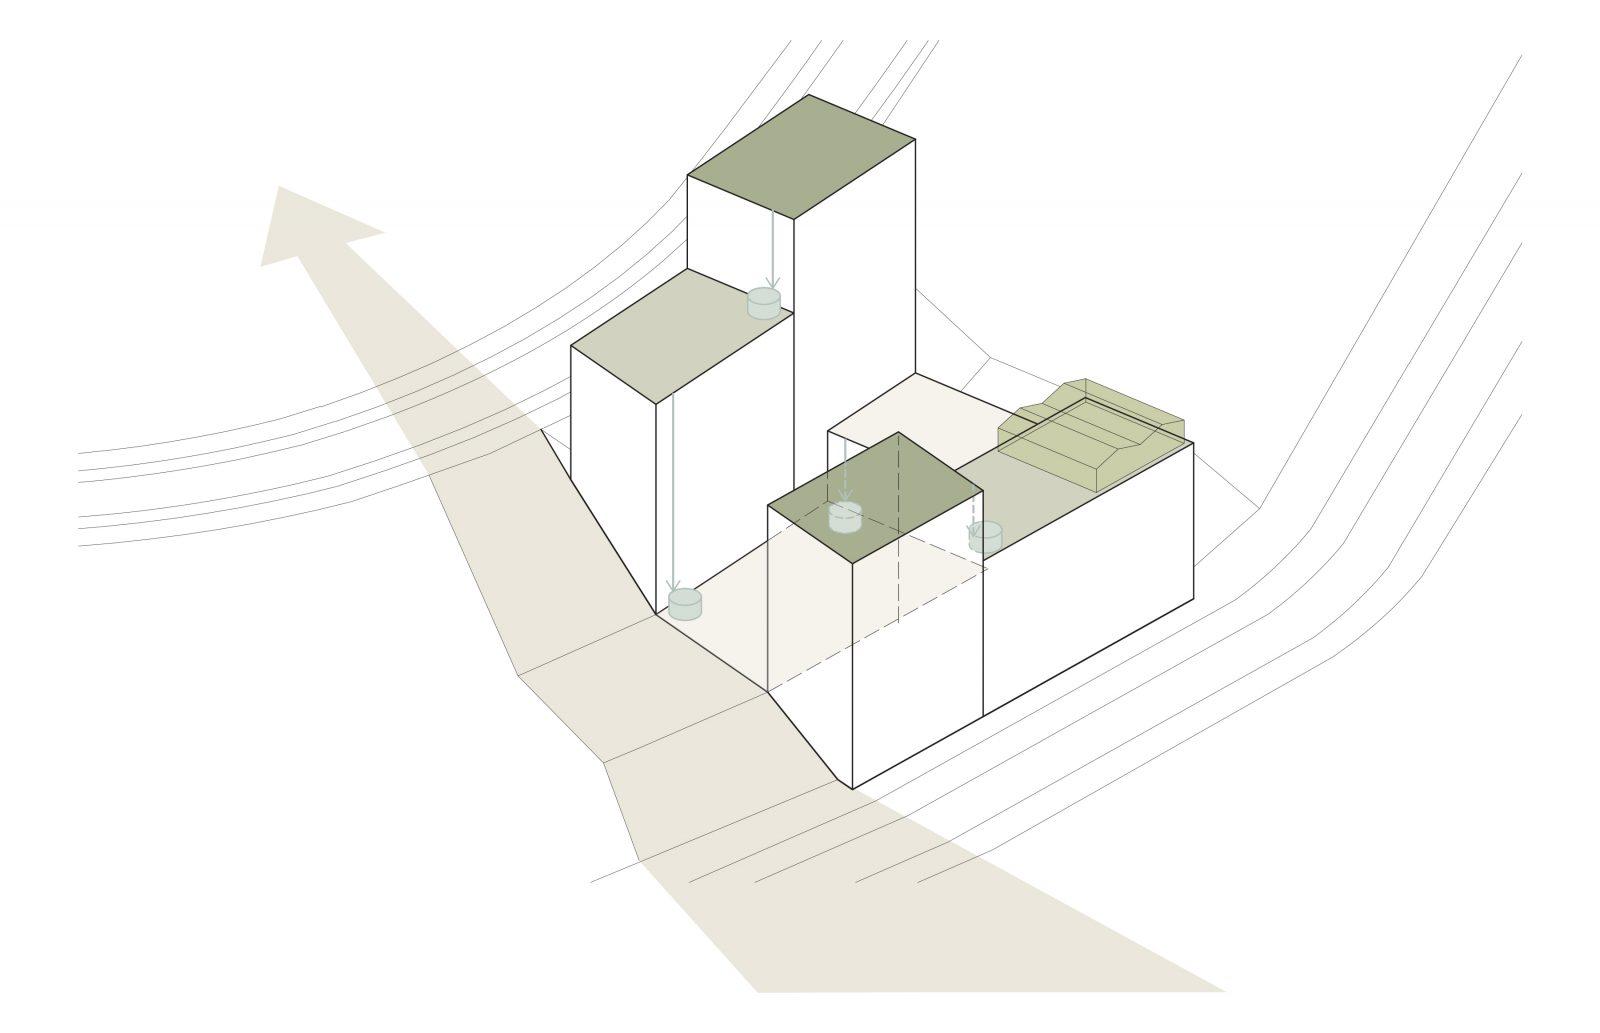 KjellanderSjoberg Hastholmssundet diagram green structure 3600x2324px